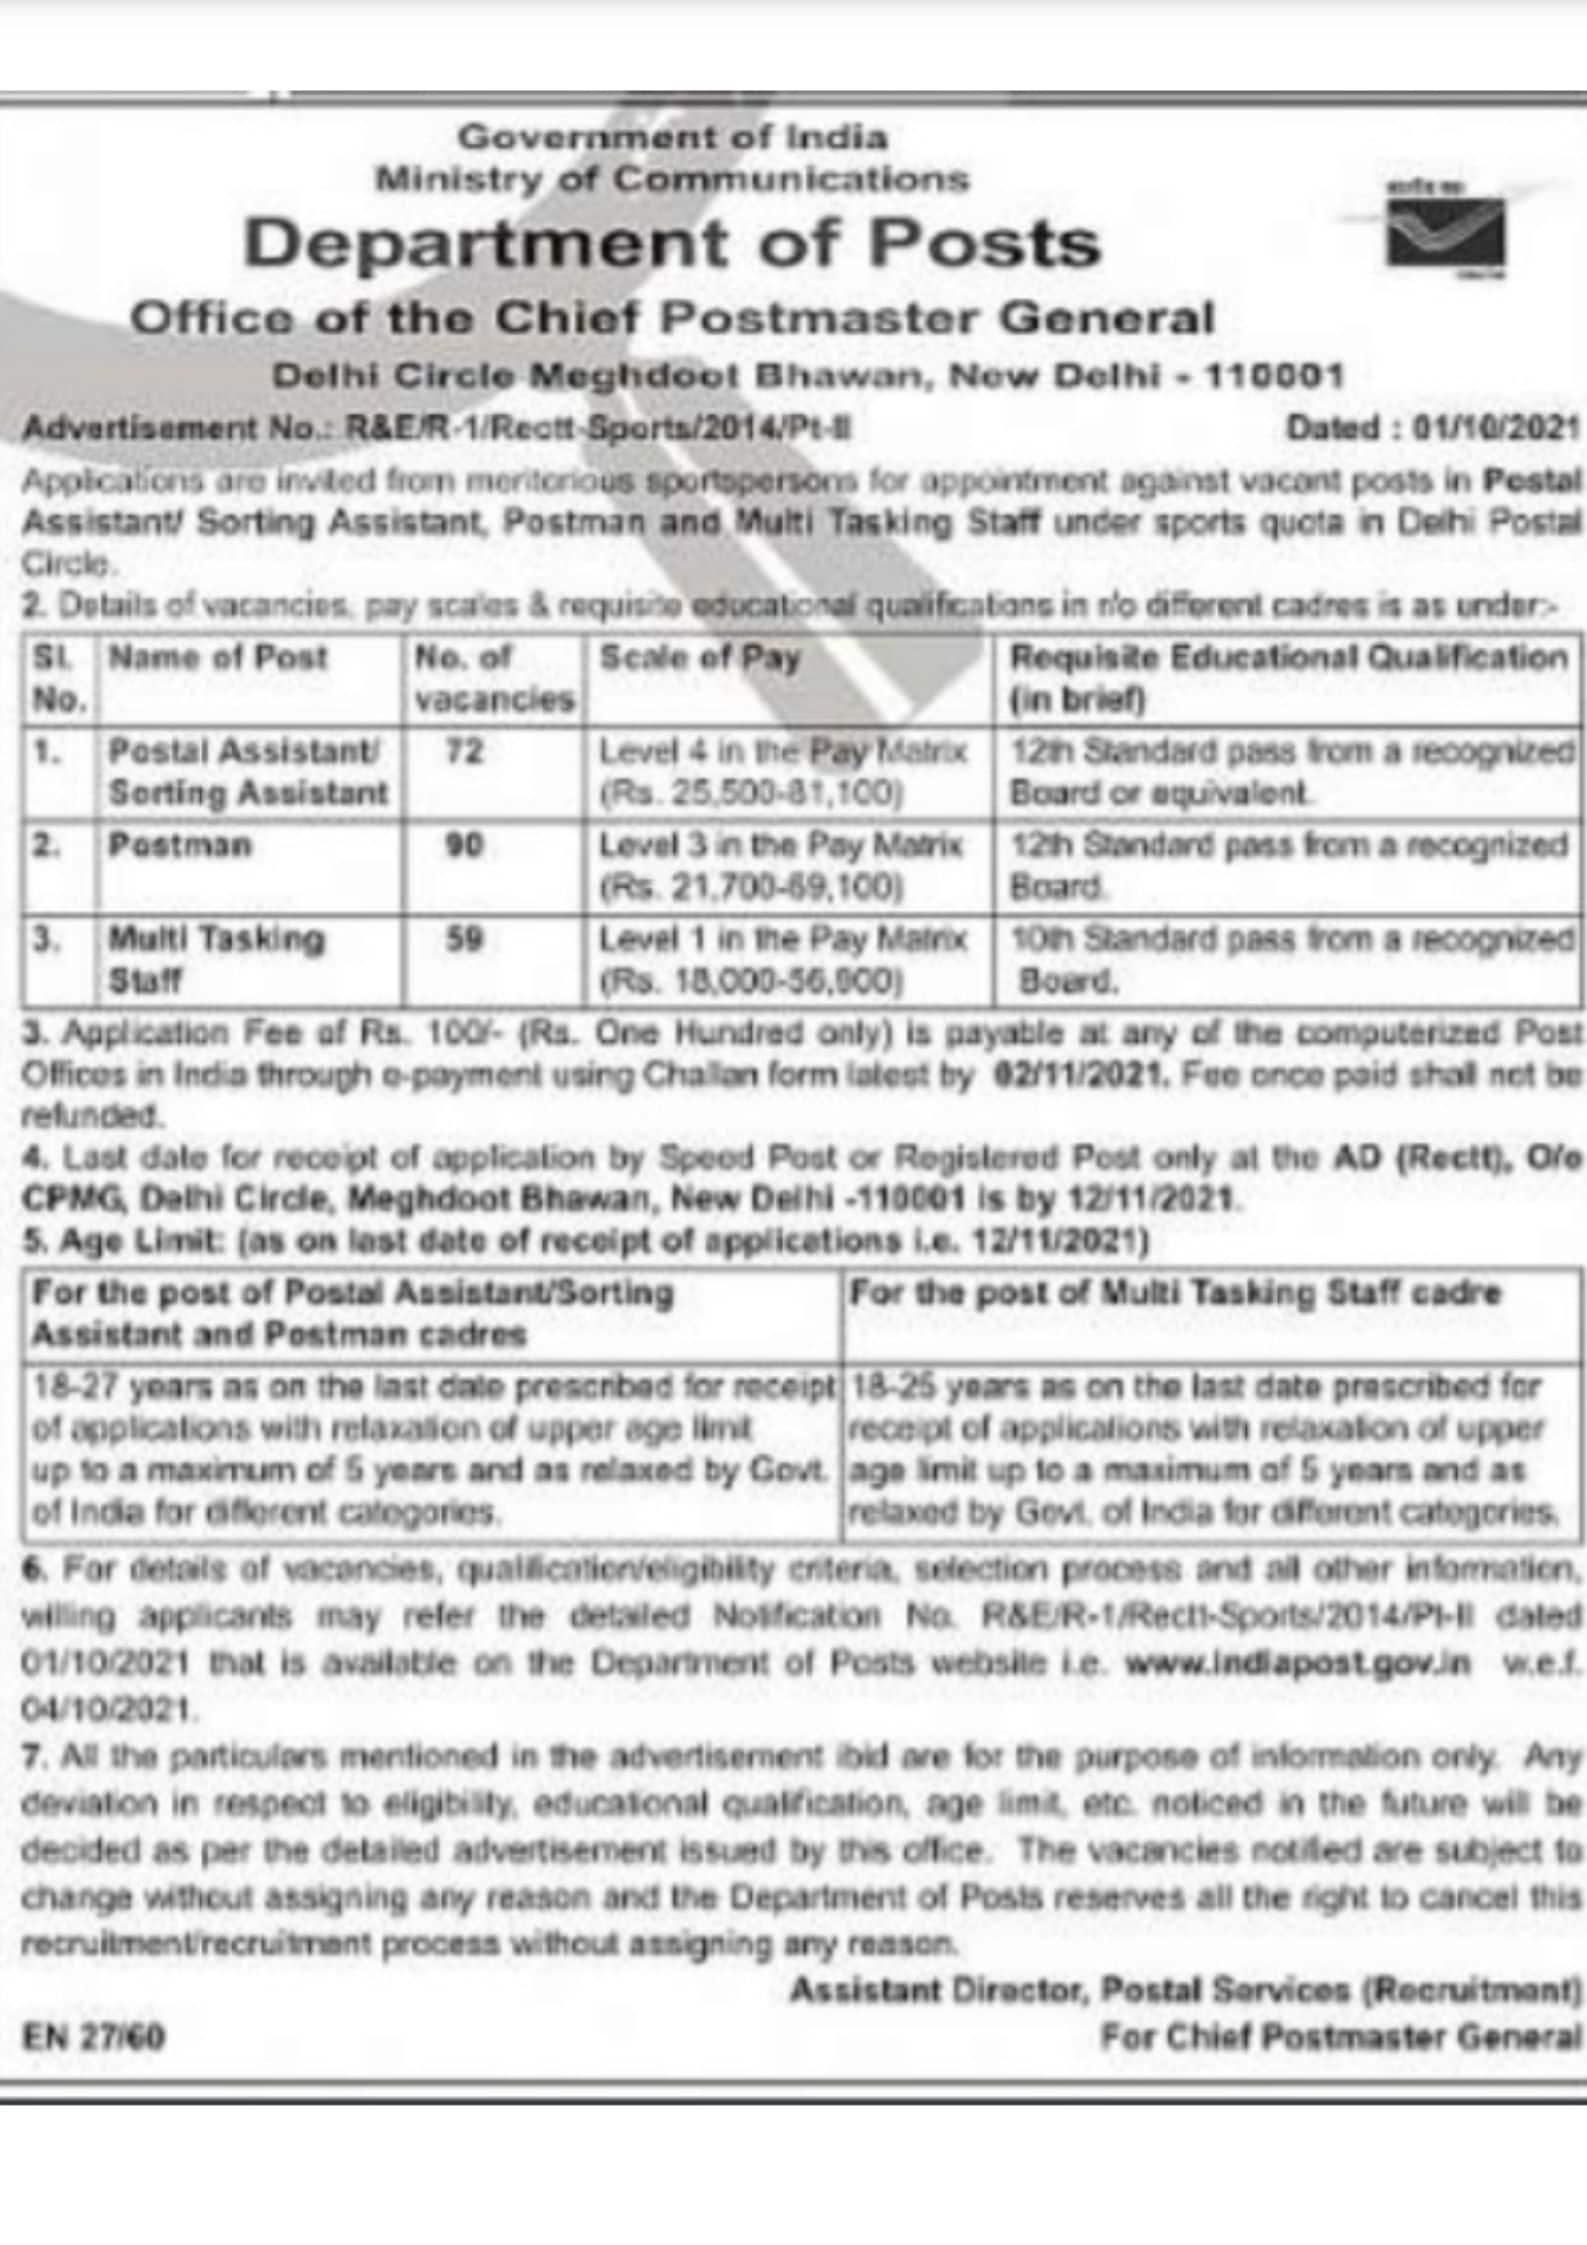 India Post recruitment 2021: Apply for 221 vacancies in Delhi postal circle, no exam needed, check details thumbnail